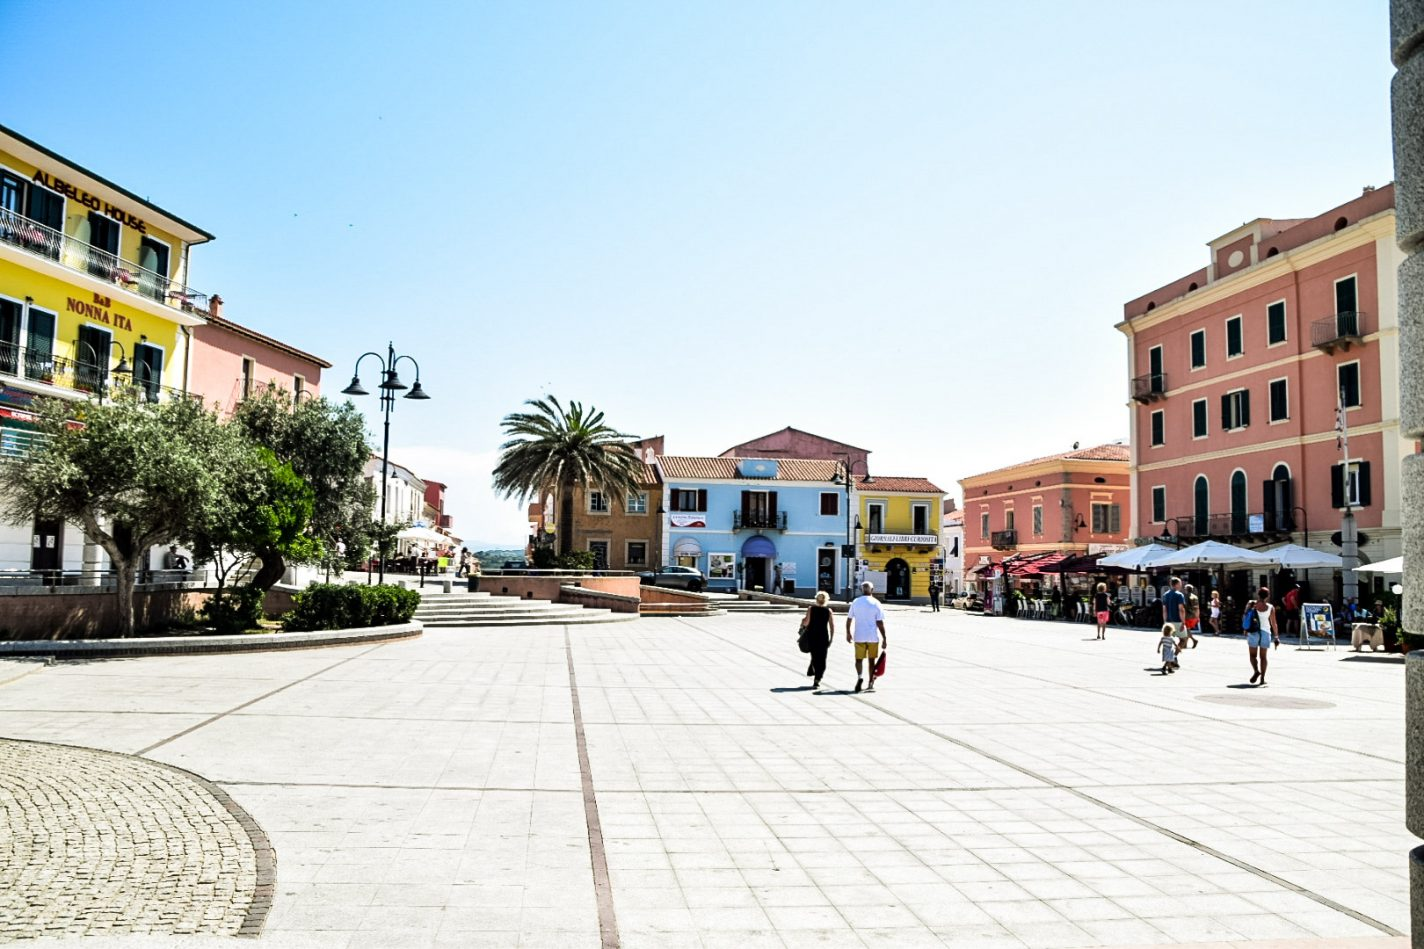 Piazza San Vittorio - het plein van Santa Teresa Gallura - Sardinië